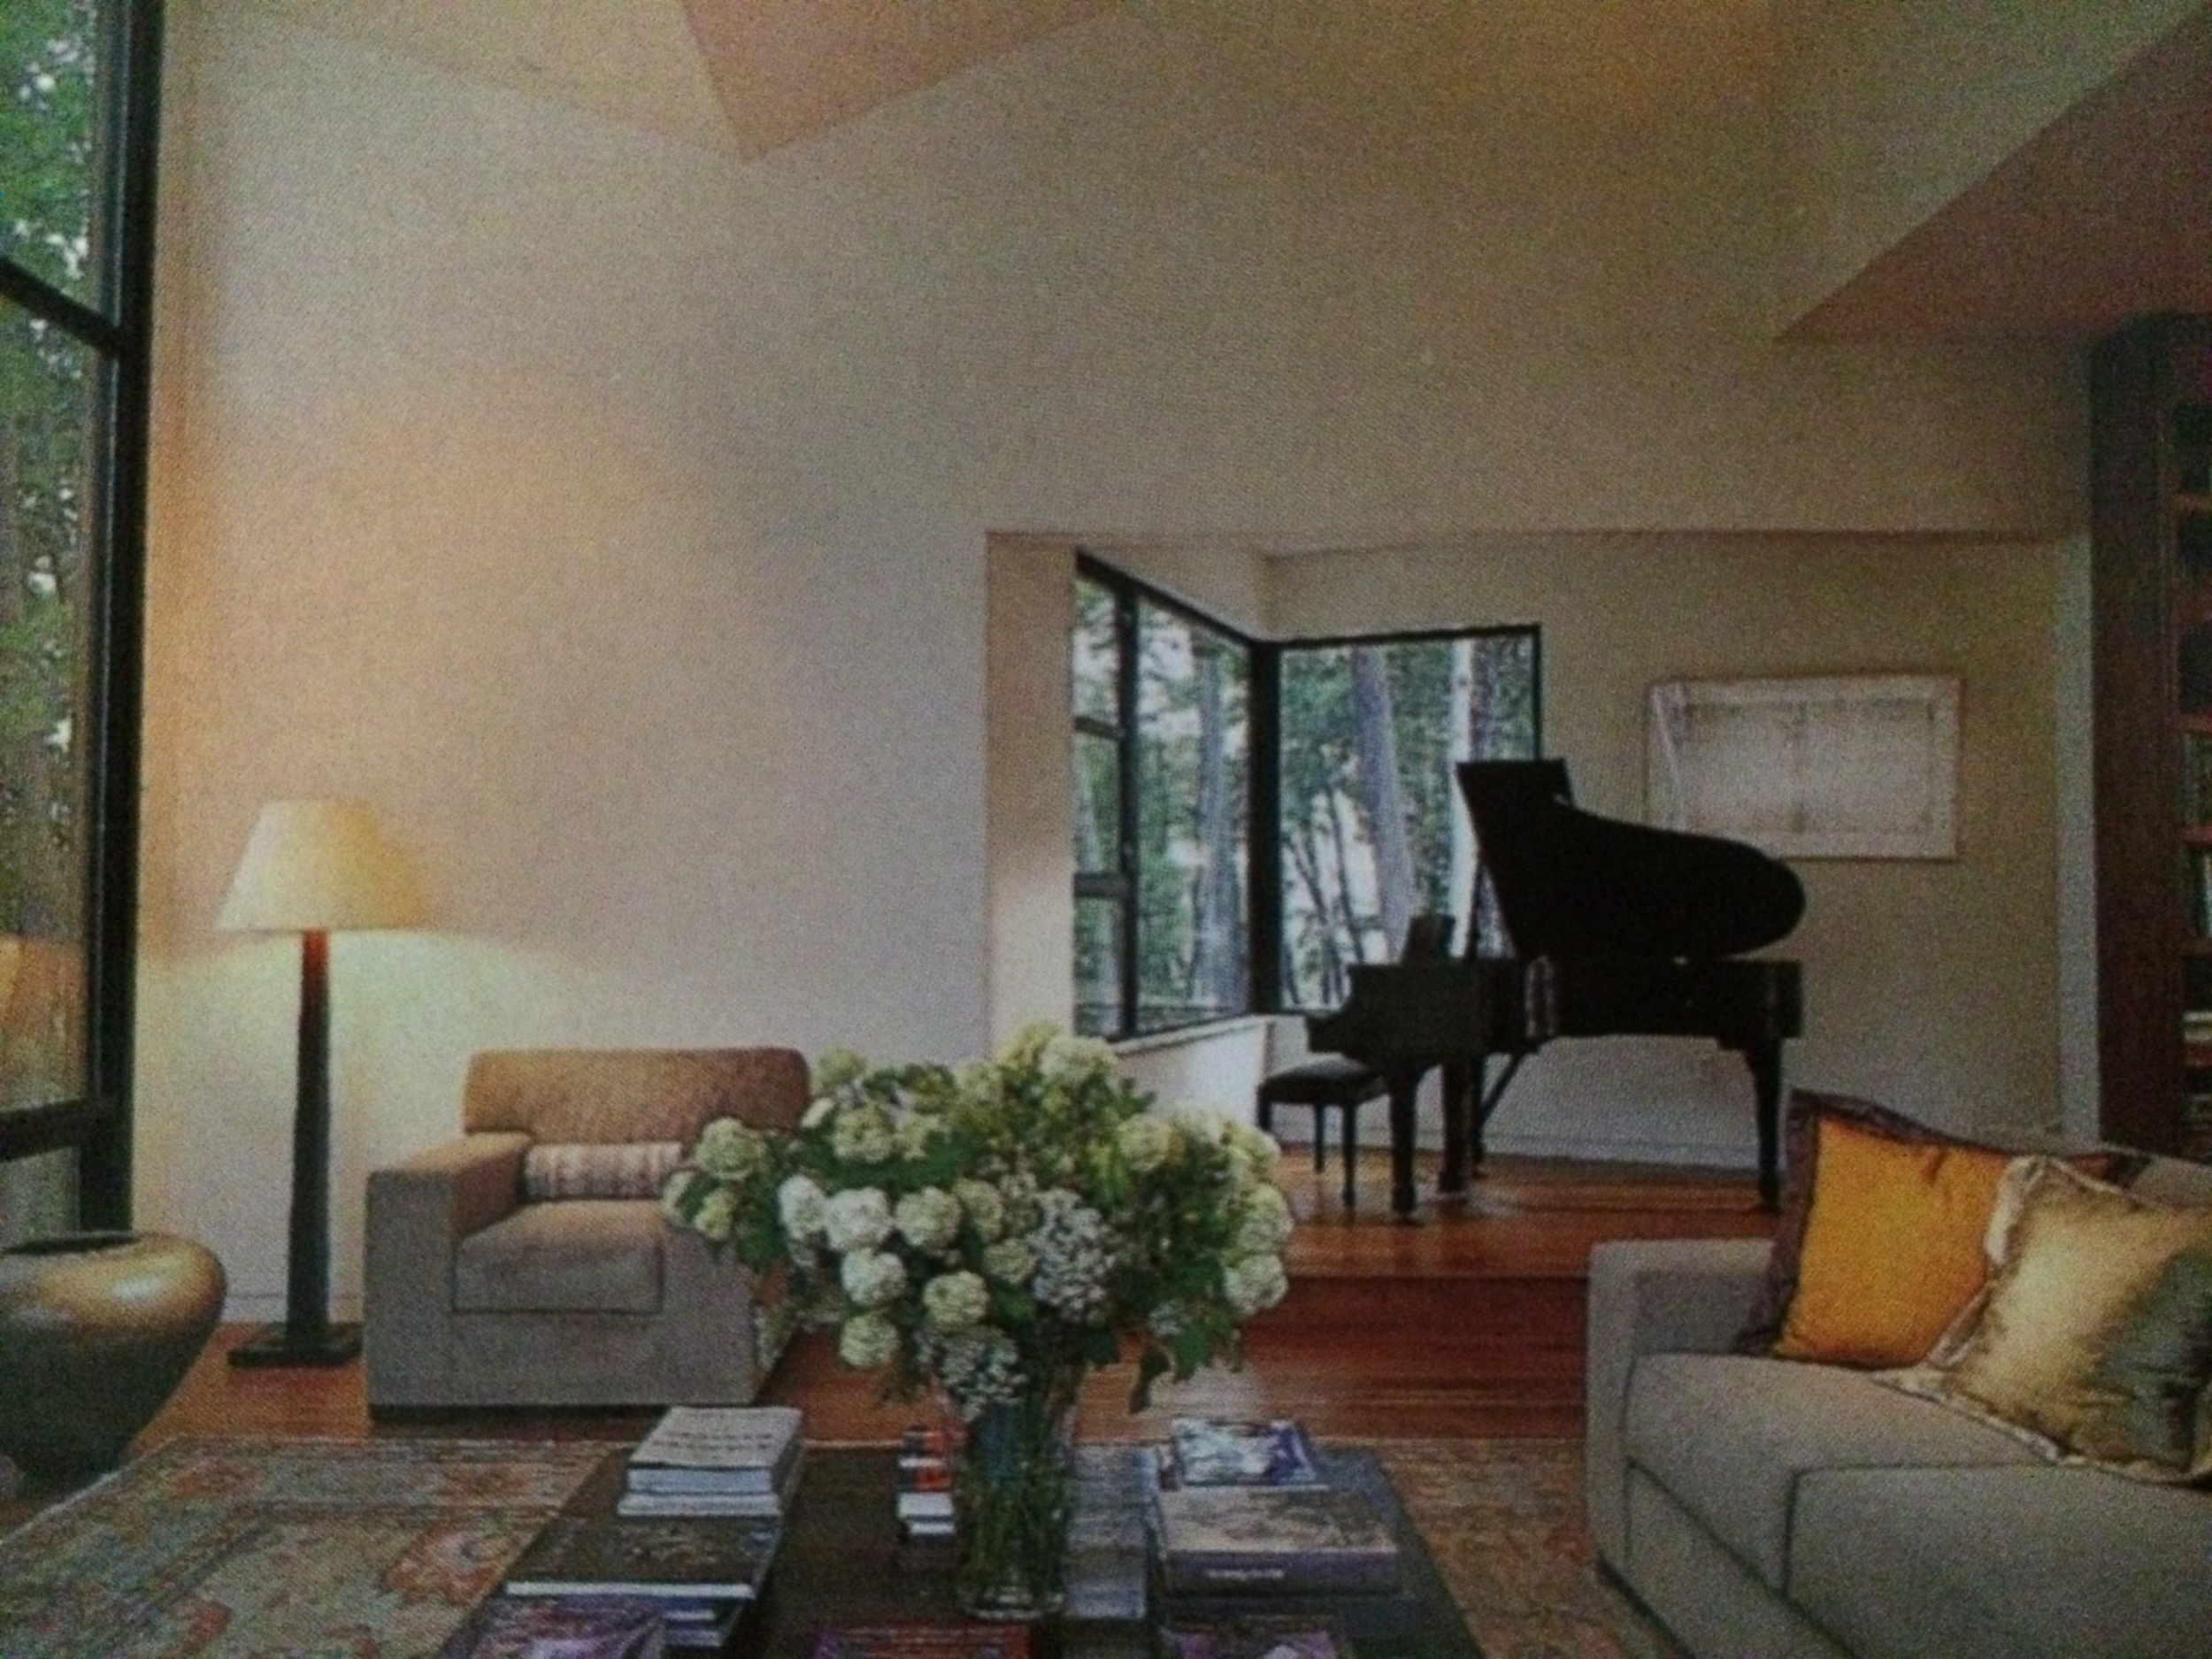 Living room, West Virginia residence